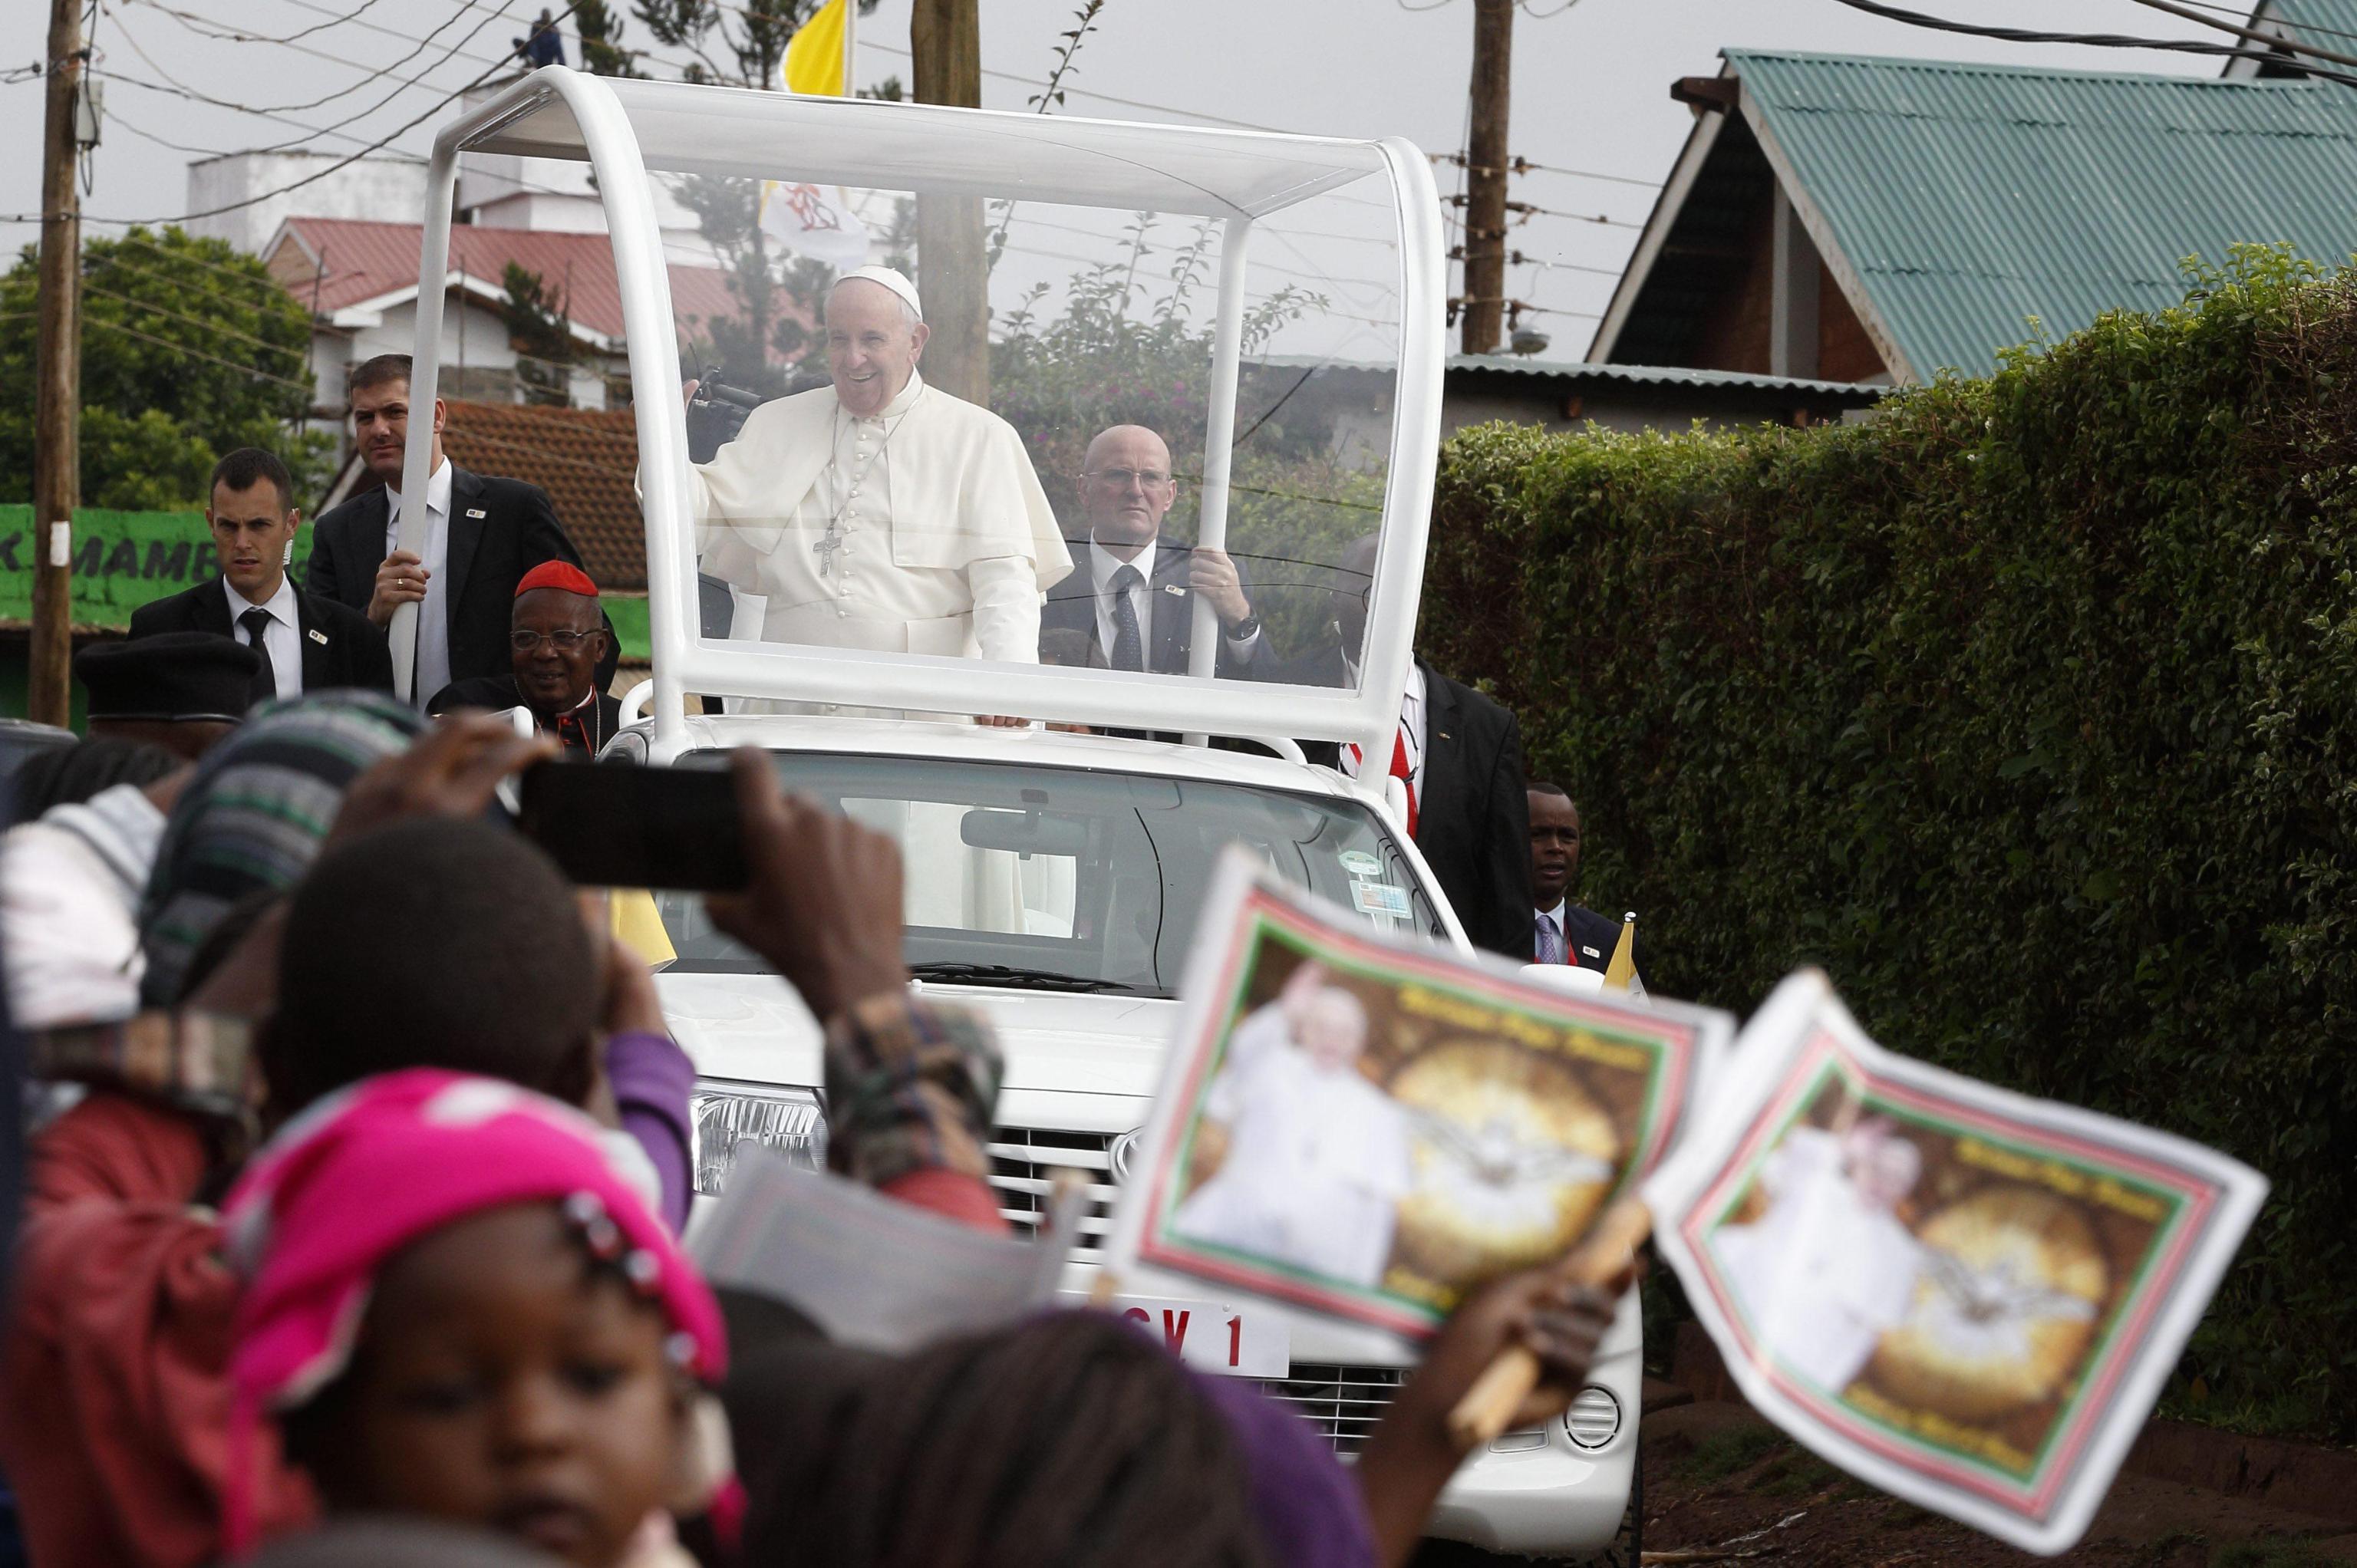 Pope Francis arrives to visit a Catholic parish in the Kangemi slum on the outskirts of Nairobi